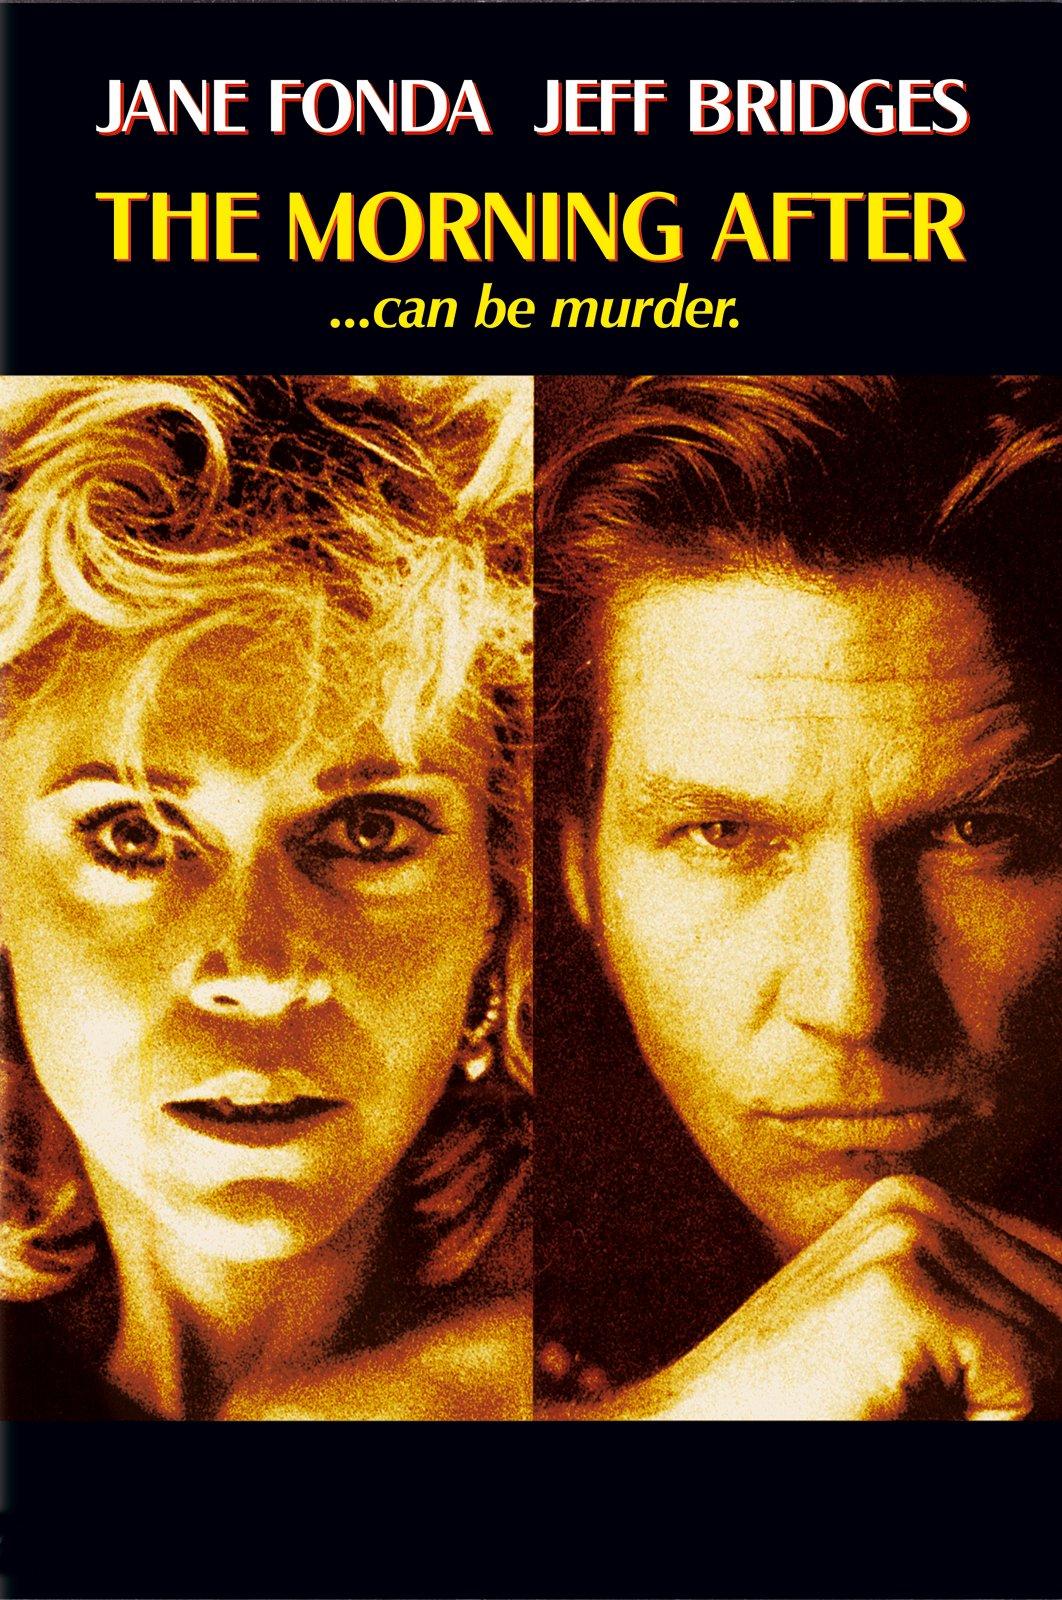 Amazon.com: The Morning After: Jane Fonda, Jeff Bridges, Raul ...